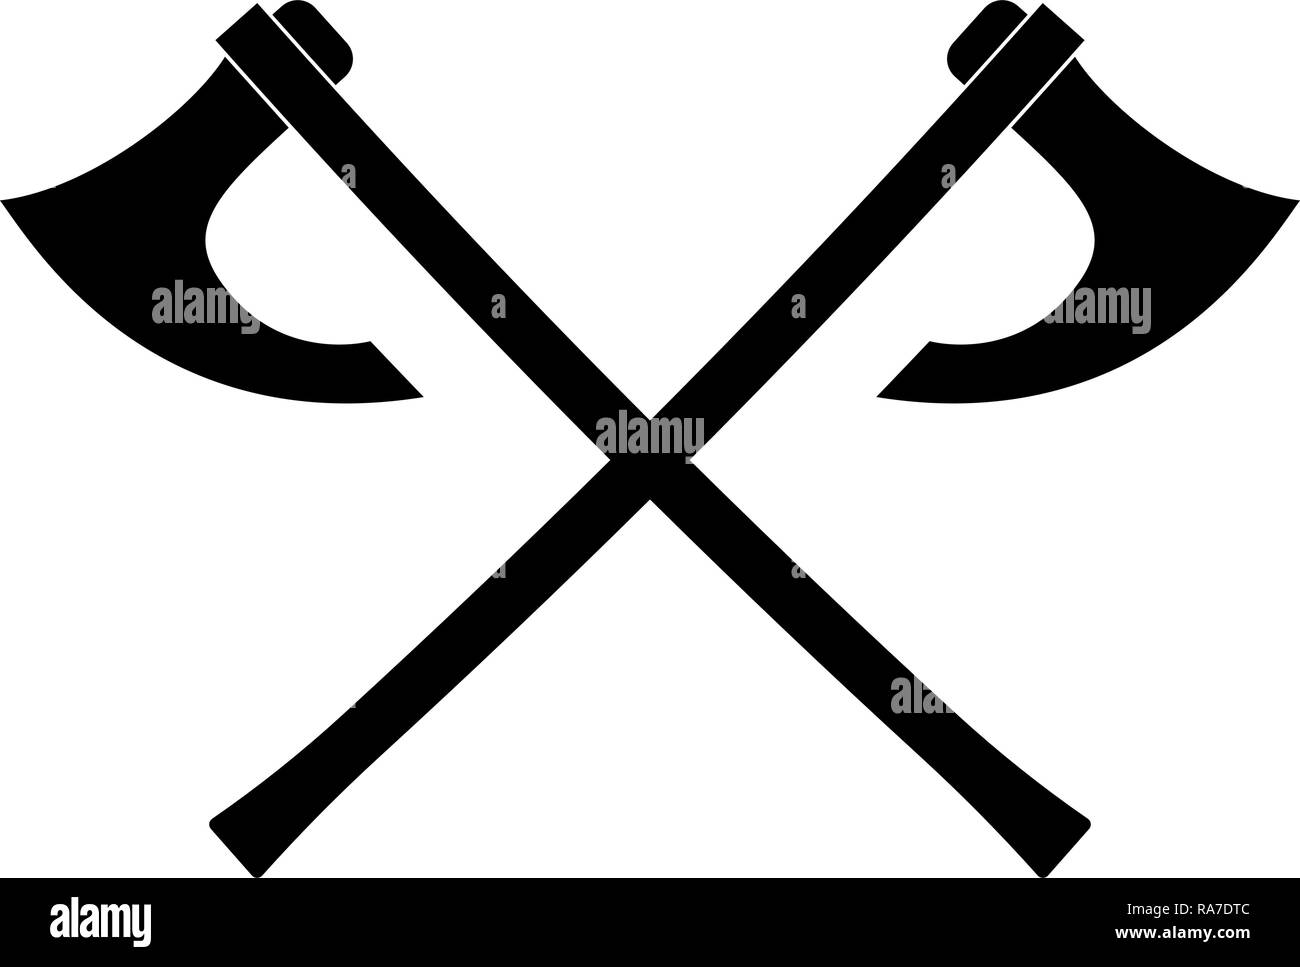 68ed24eca06eb Two battle axes vikings icon black color vector I flat style simple image -  Stock Image